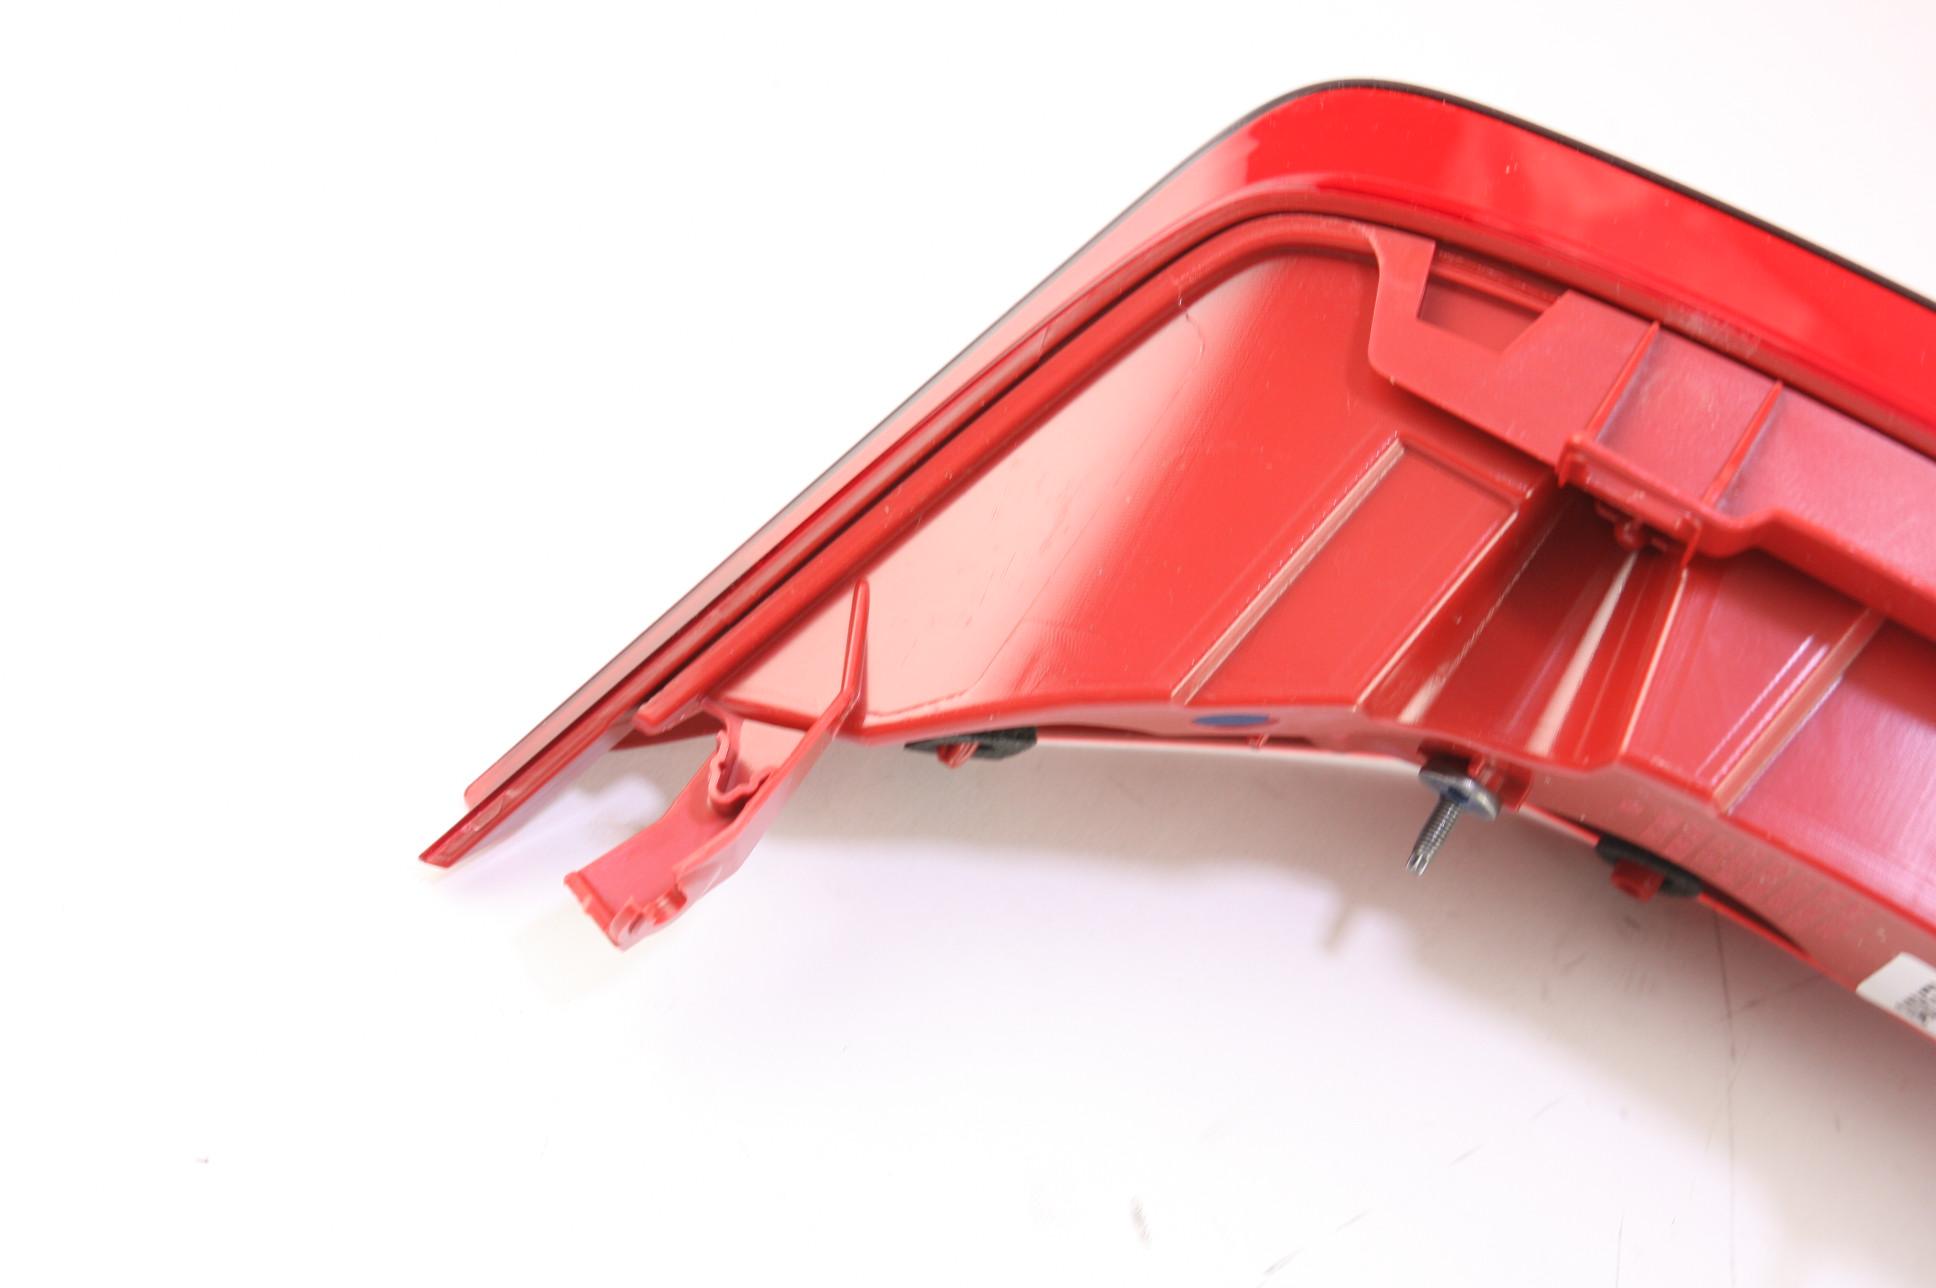 New OEM 84081570 Genuine GM 13-18 Cadillac ATS Sedan Tail Light Passenger Side - image 9